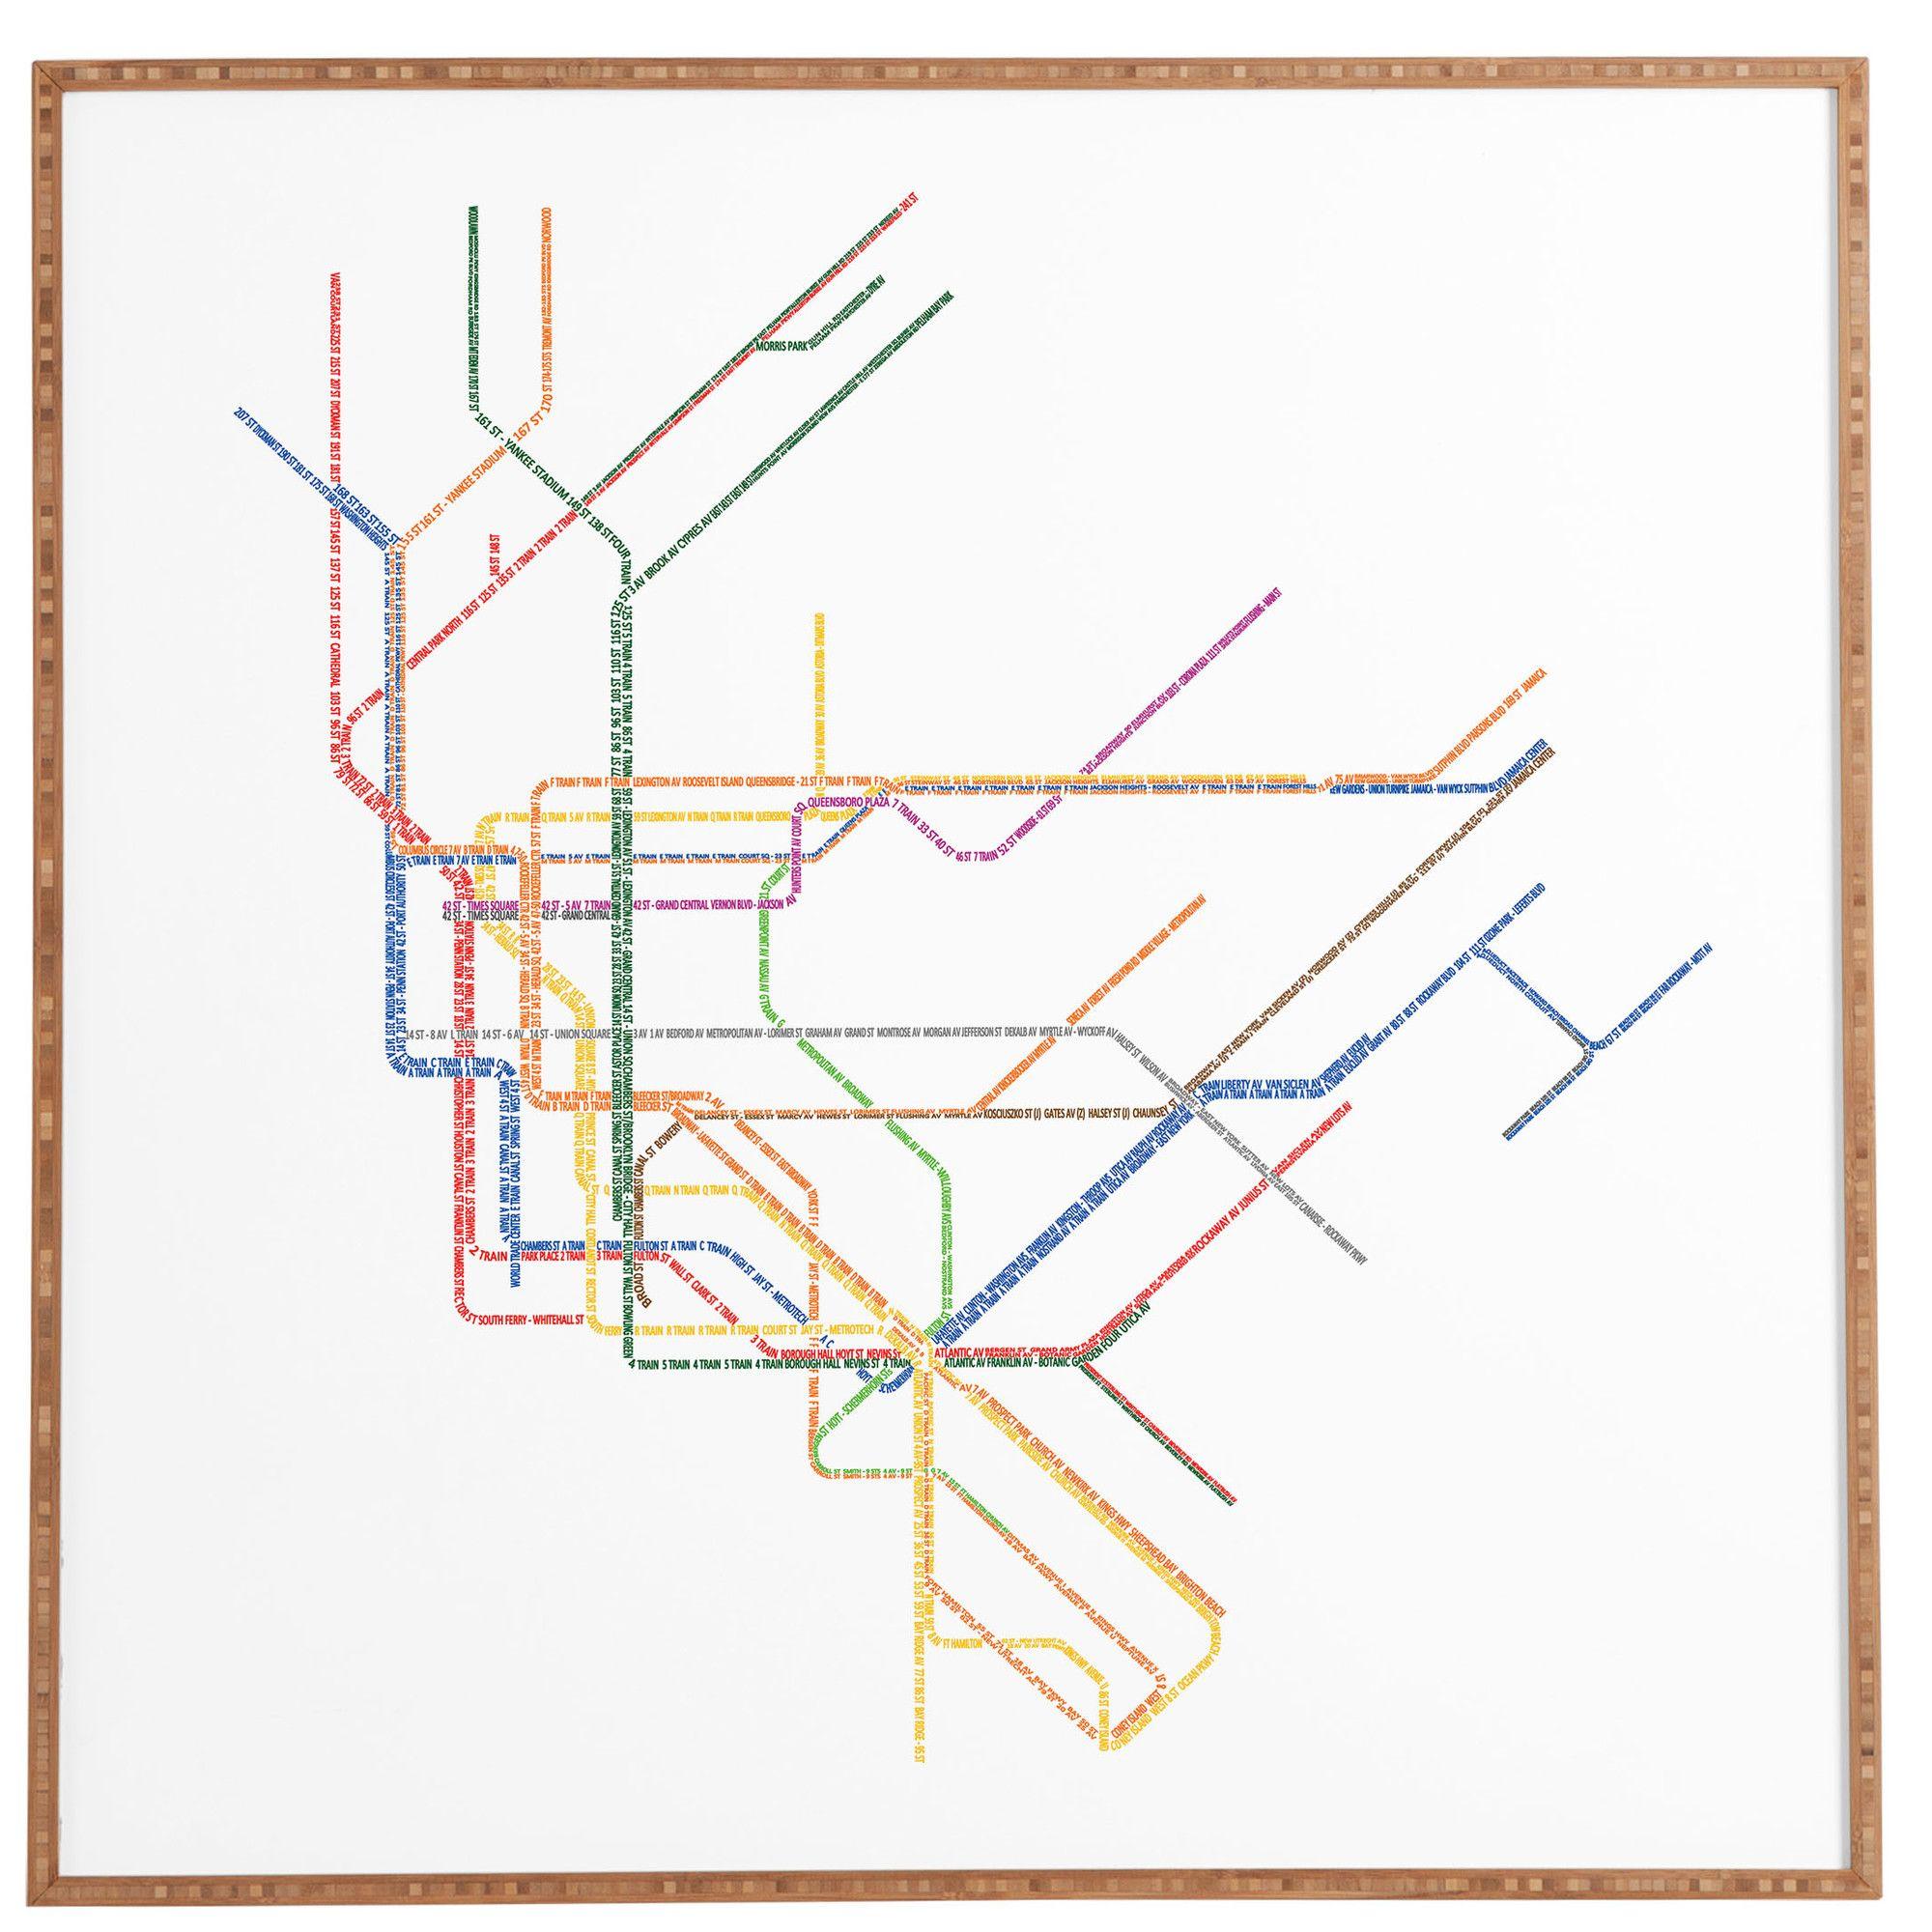 Blank Nyc Subway Map.Nyc Subway Map Framed Wall Art Products Framed Wall Art Frames